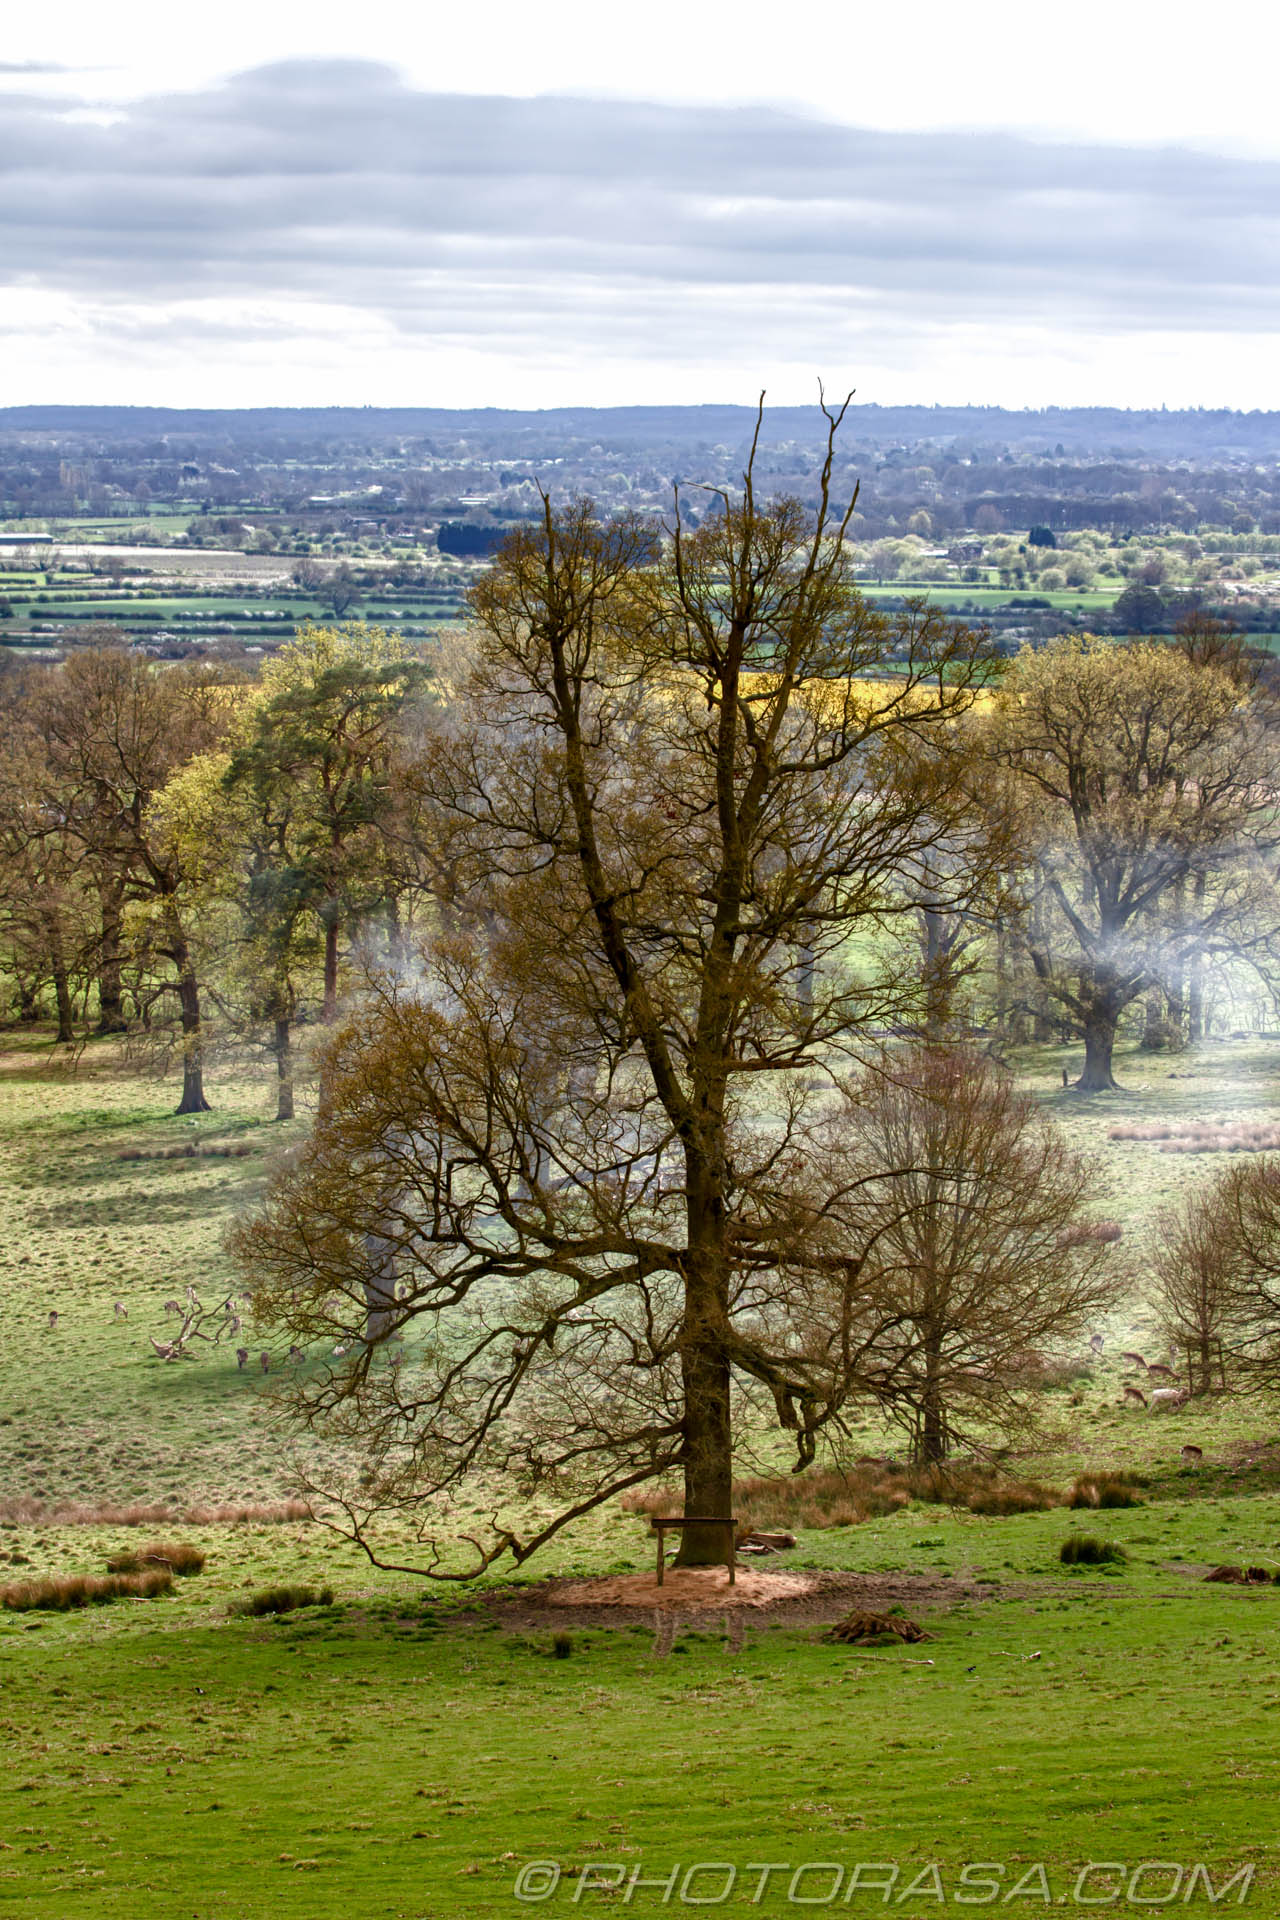 http://photorasa.com/view-boughton-monchelsea-churchyard/large-oak-in-deer-park/